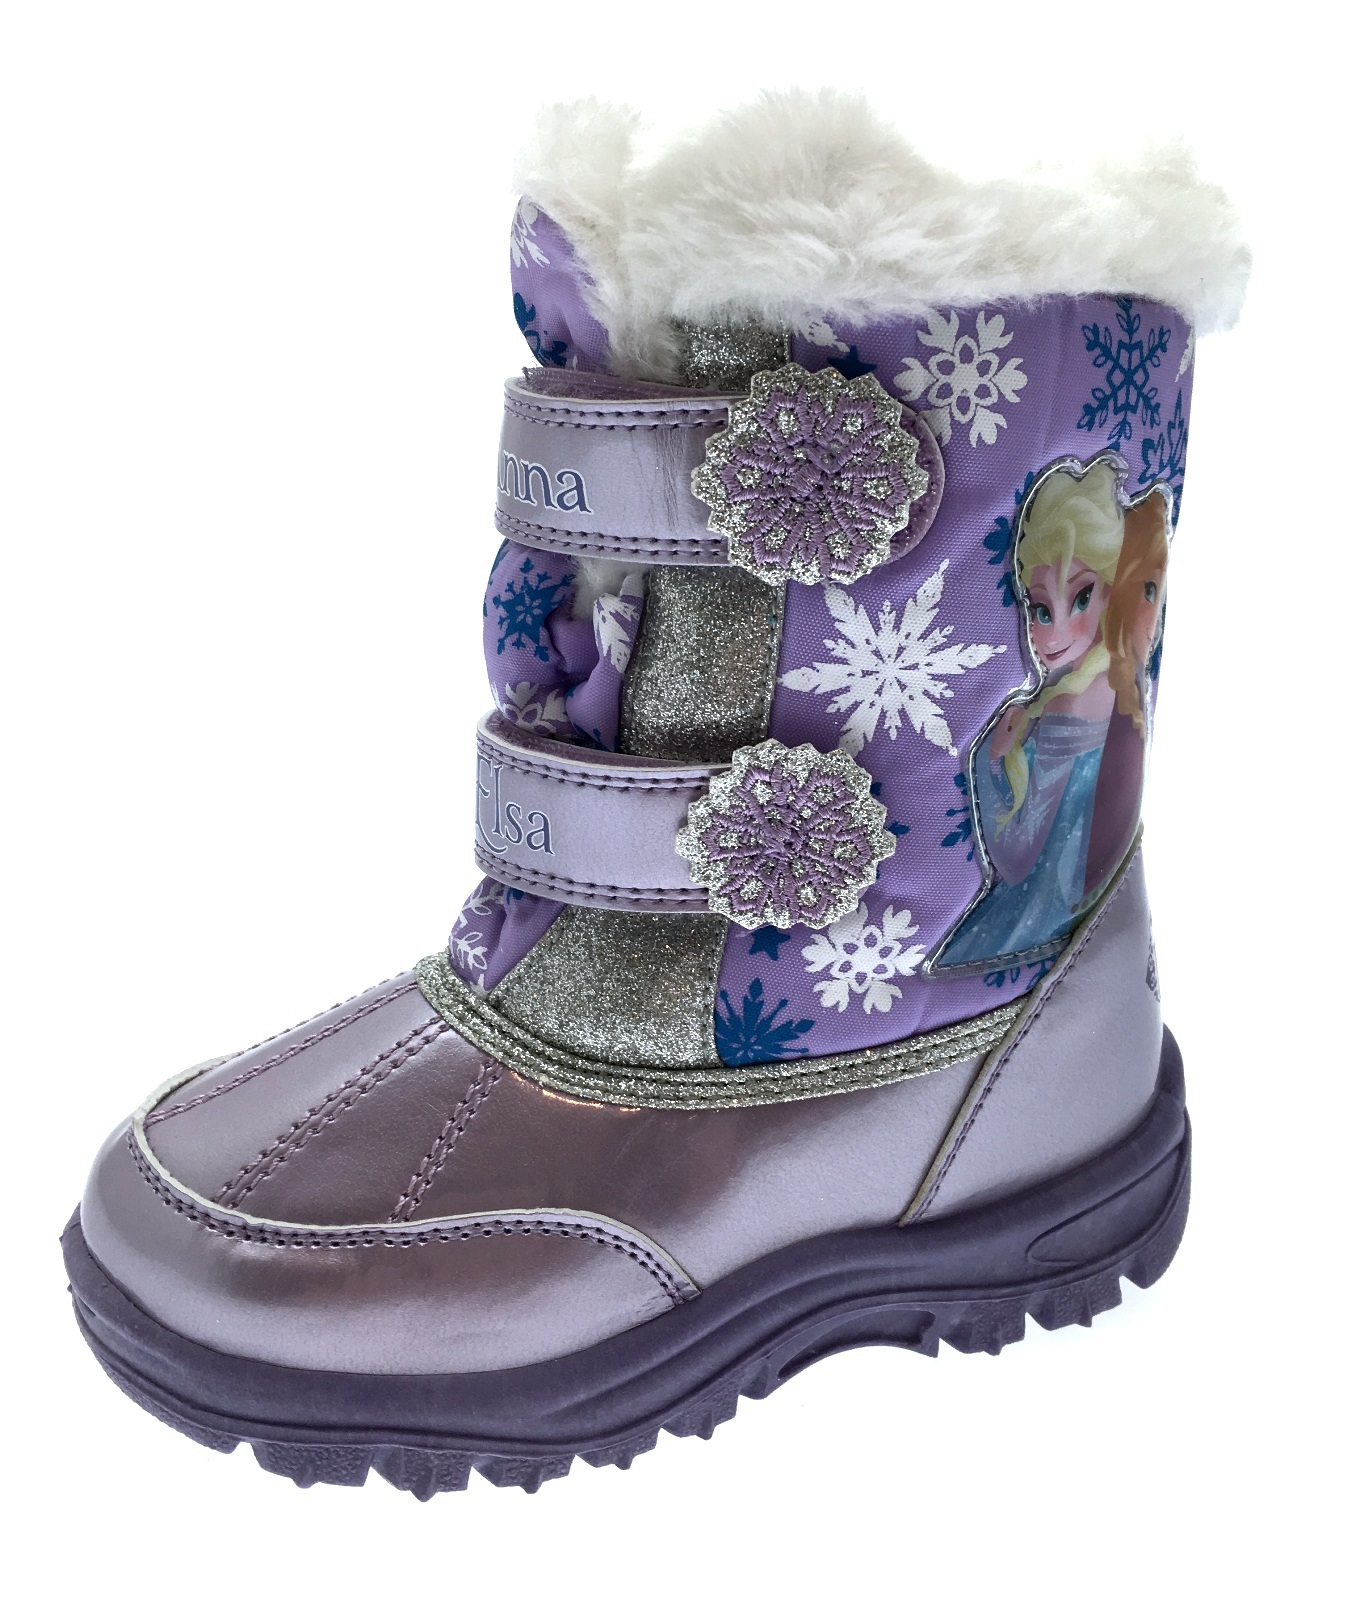 Girls Disney Frozen Elsa Anna Snow Boots Kids Waterproof